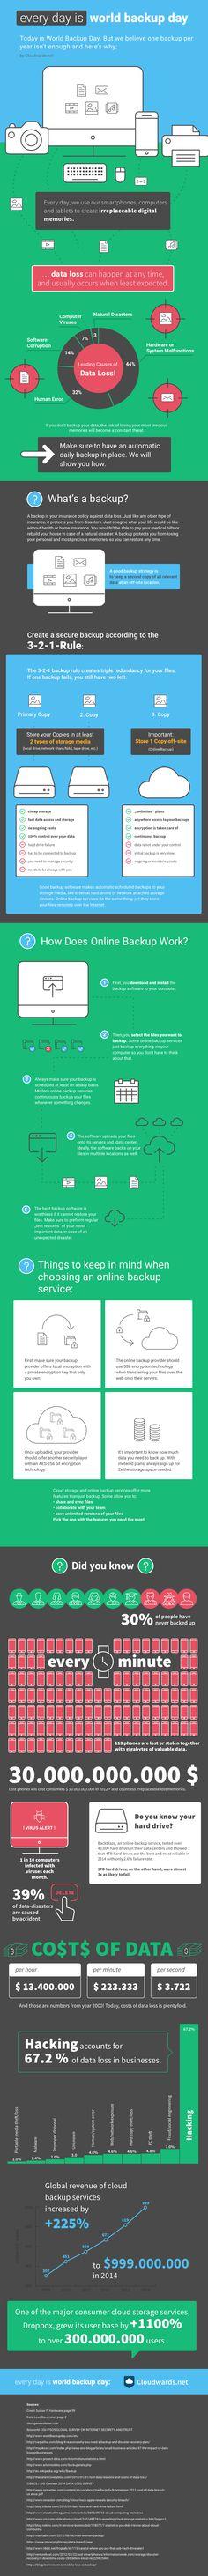 Cloudwards.net – World Backup Day 2015